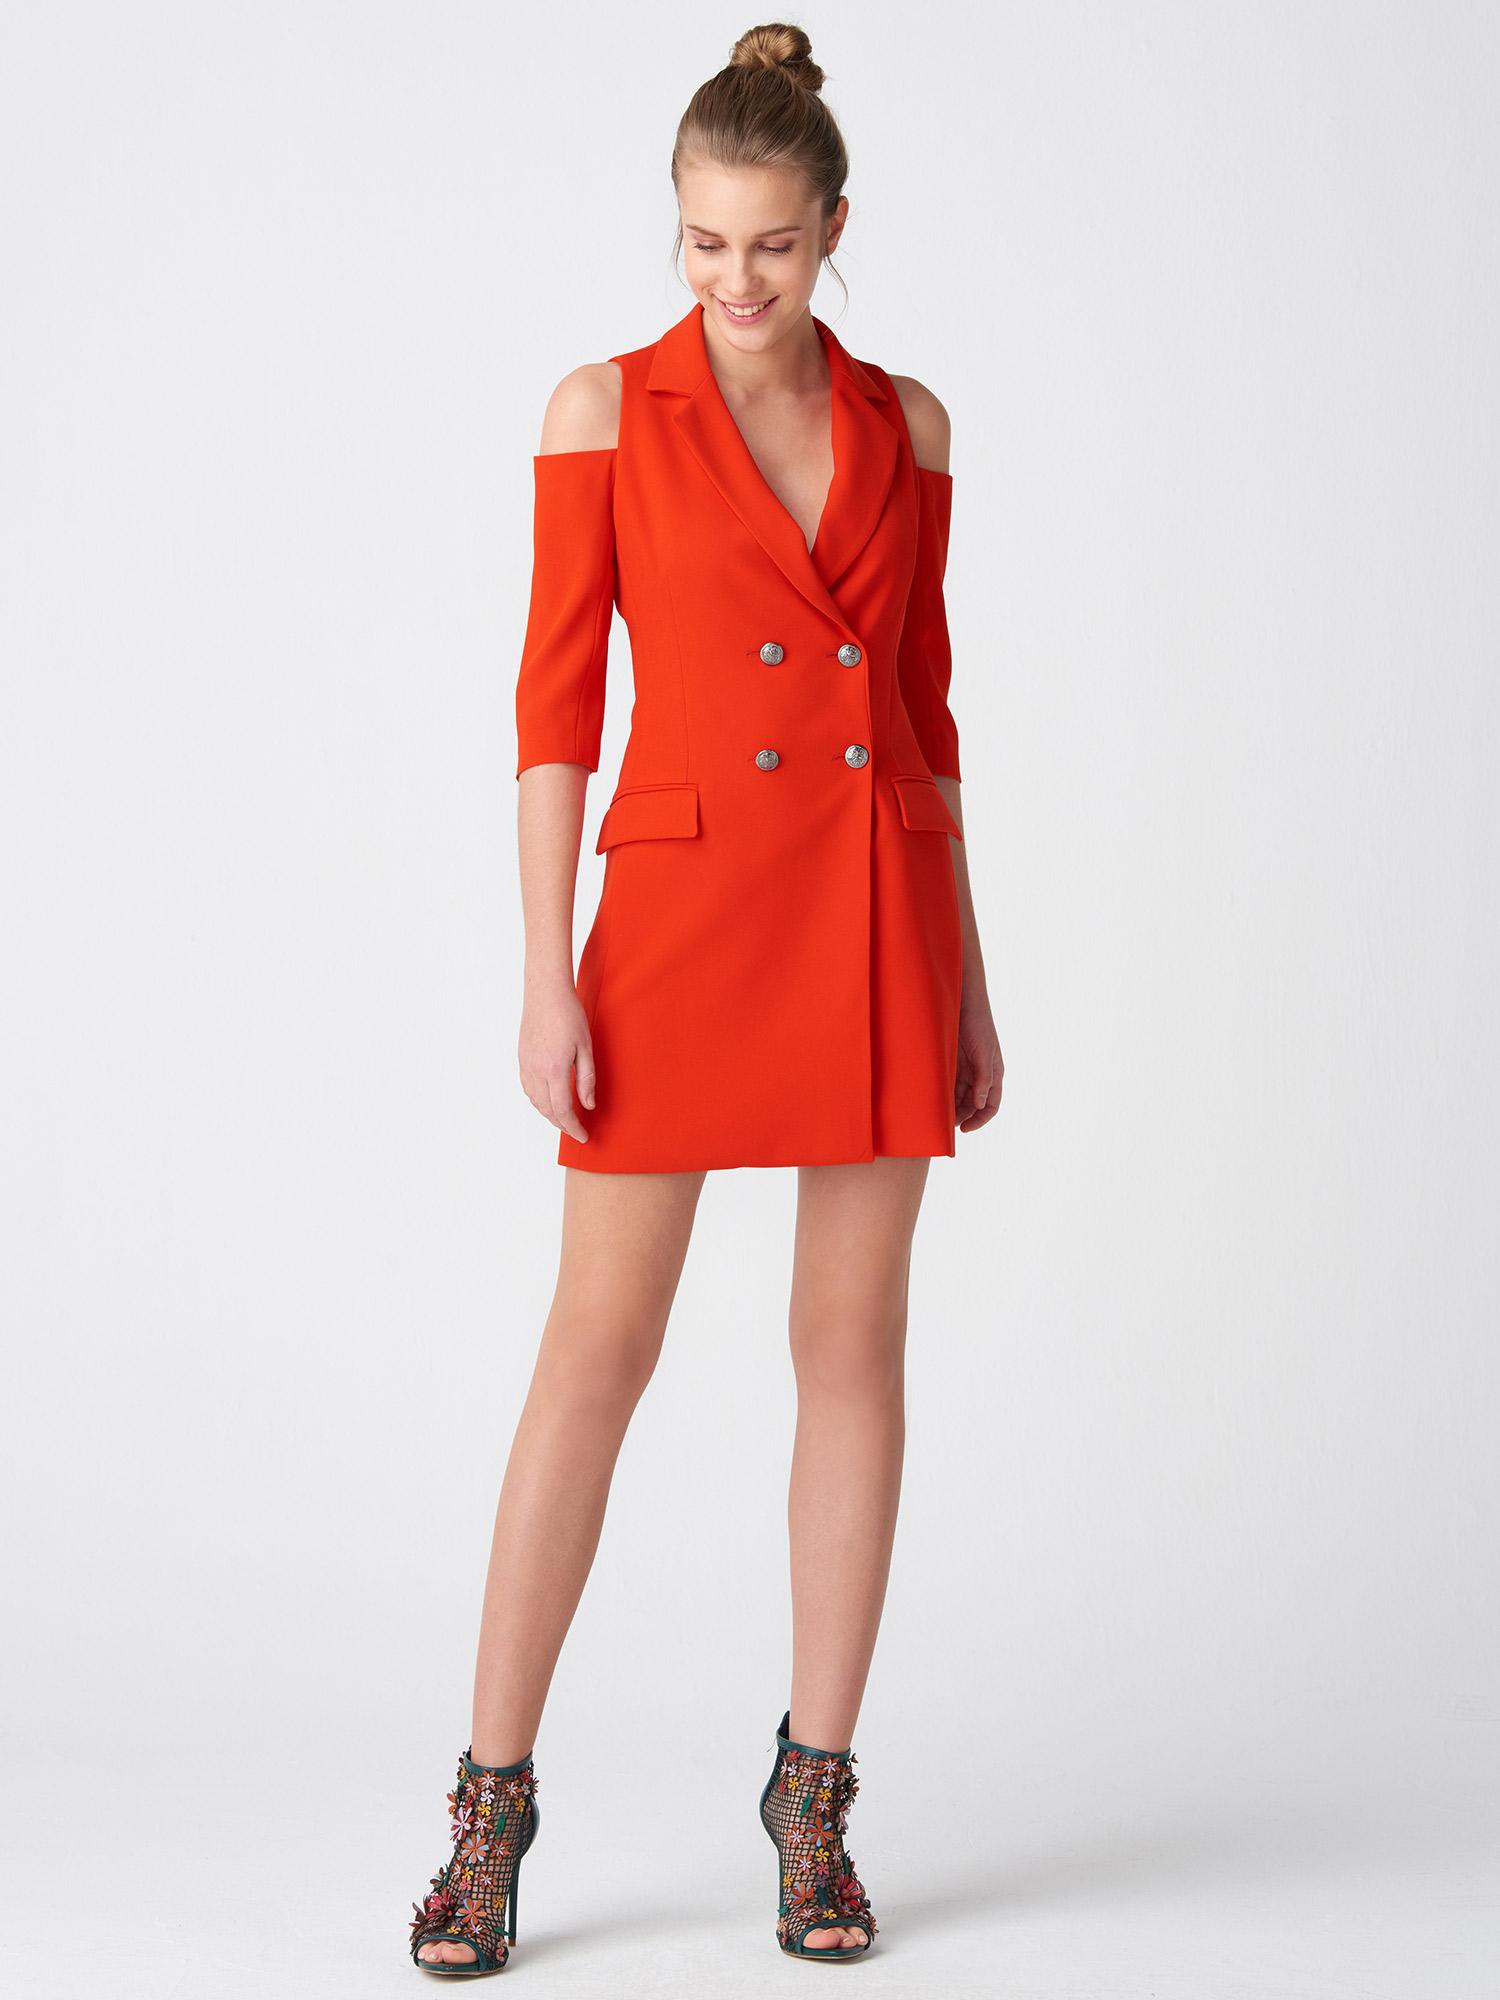 f5a422cb35c89 6709 Omuzu Açık Kruvaze Ceket Elbise-Kırmızı   ELBİSE   DILVIN